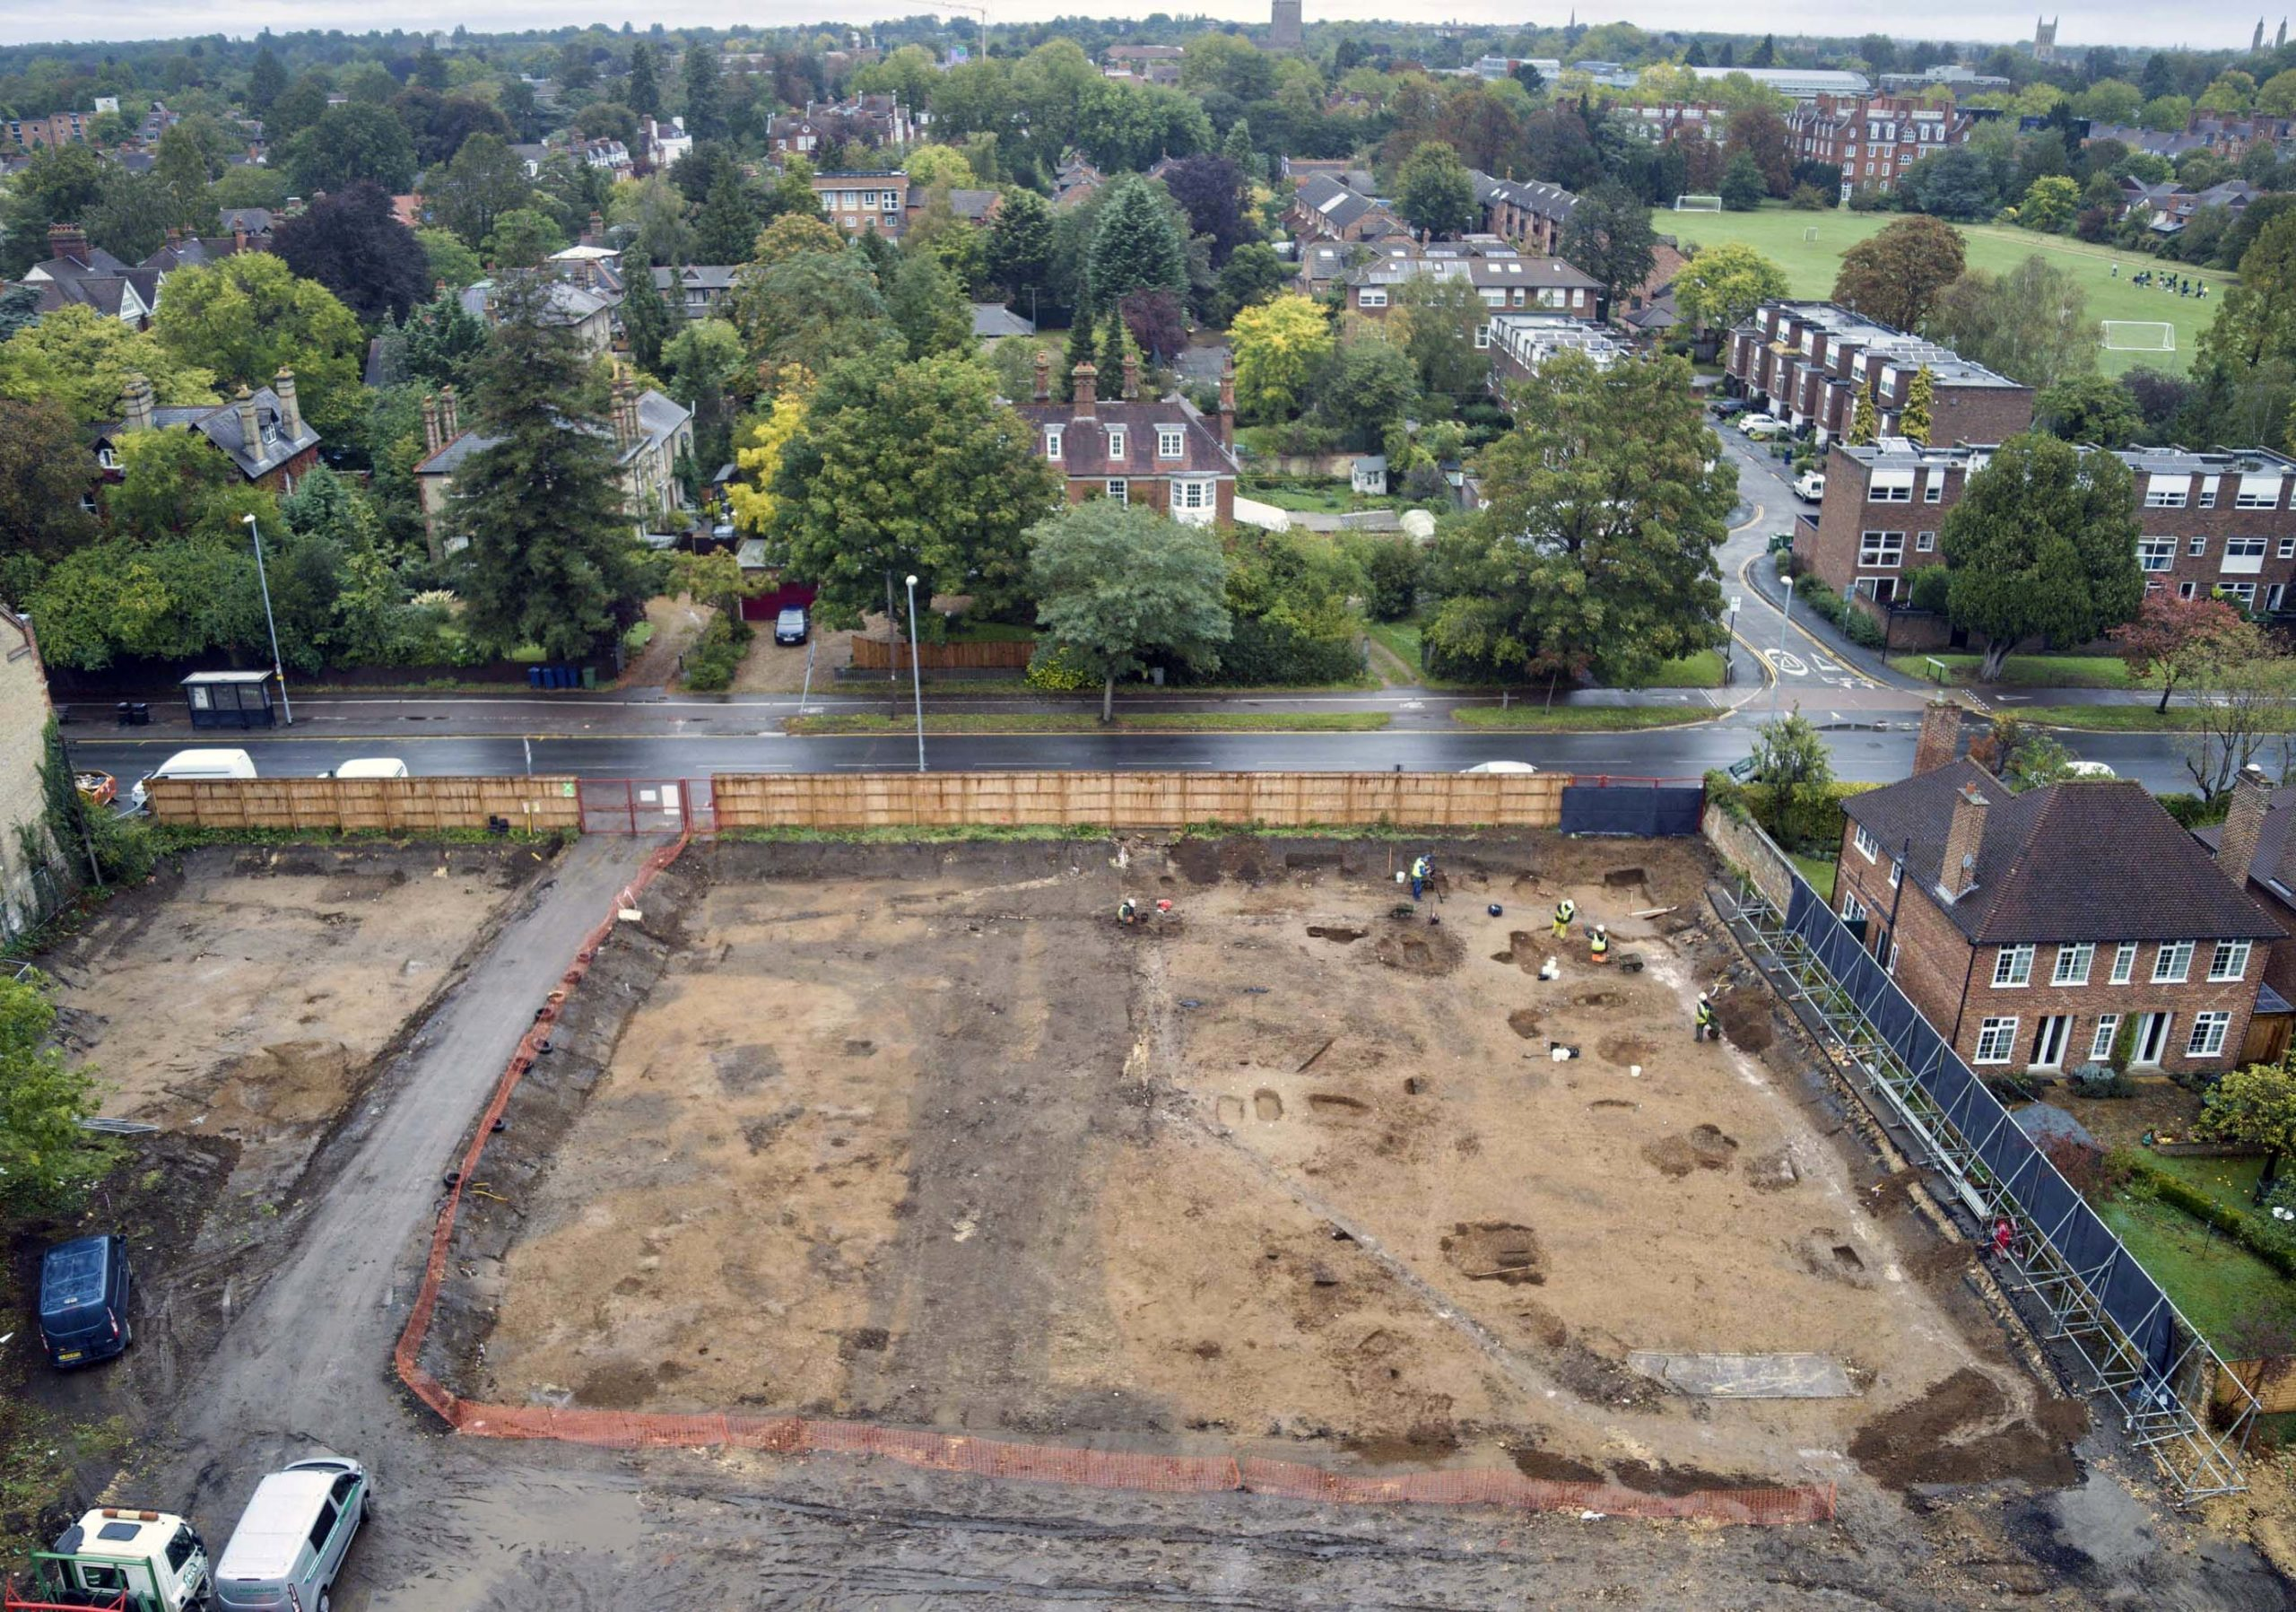 croft gardens archaeological site